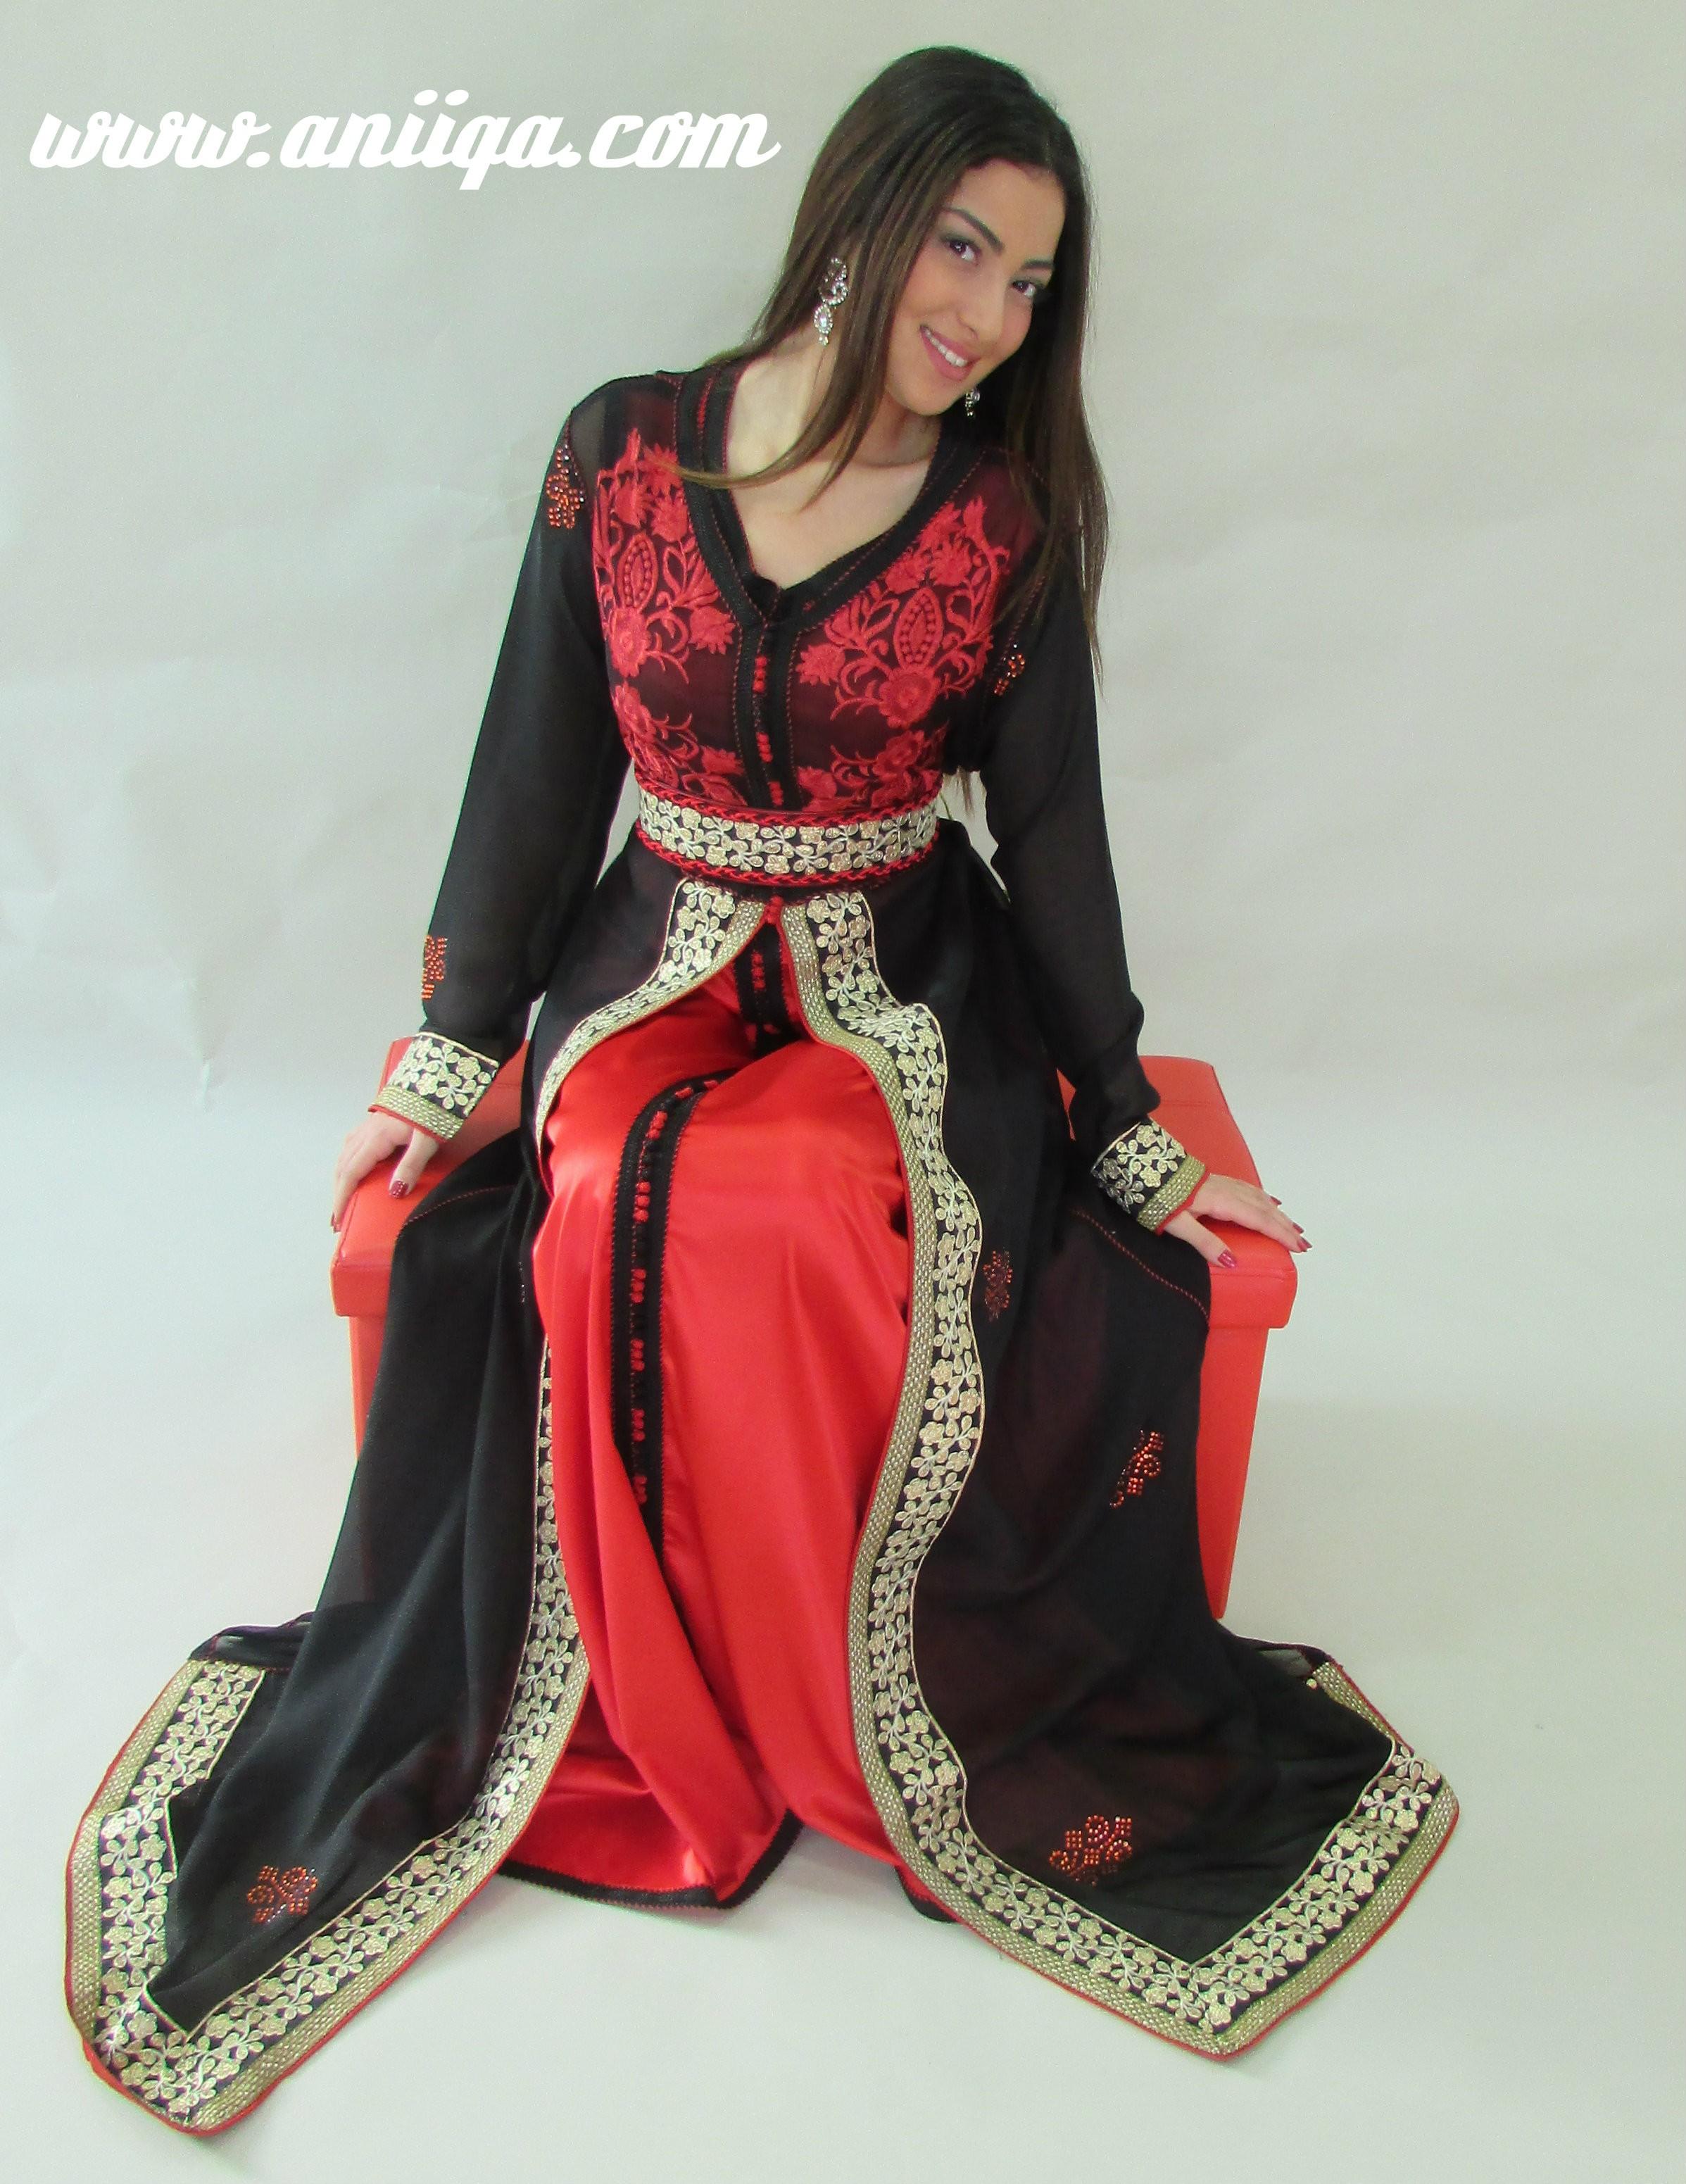 Robe marocaine rouge pas cher